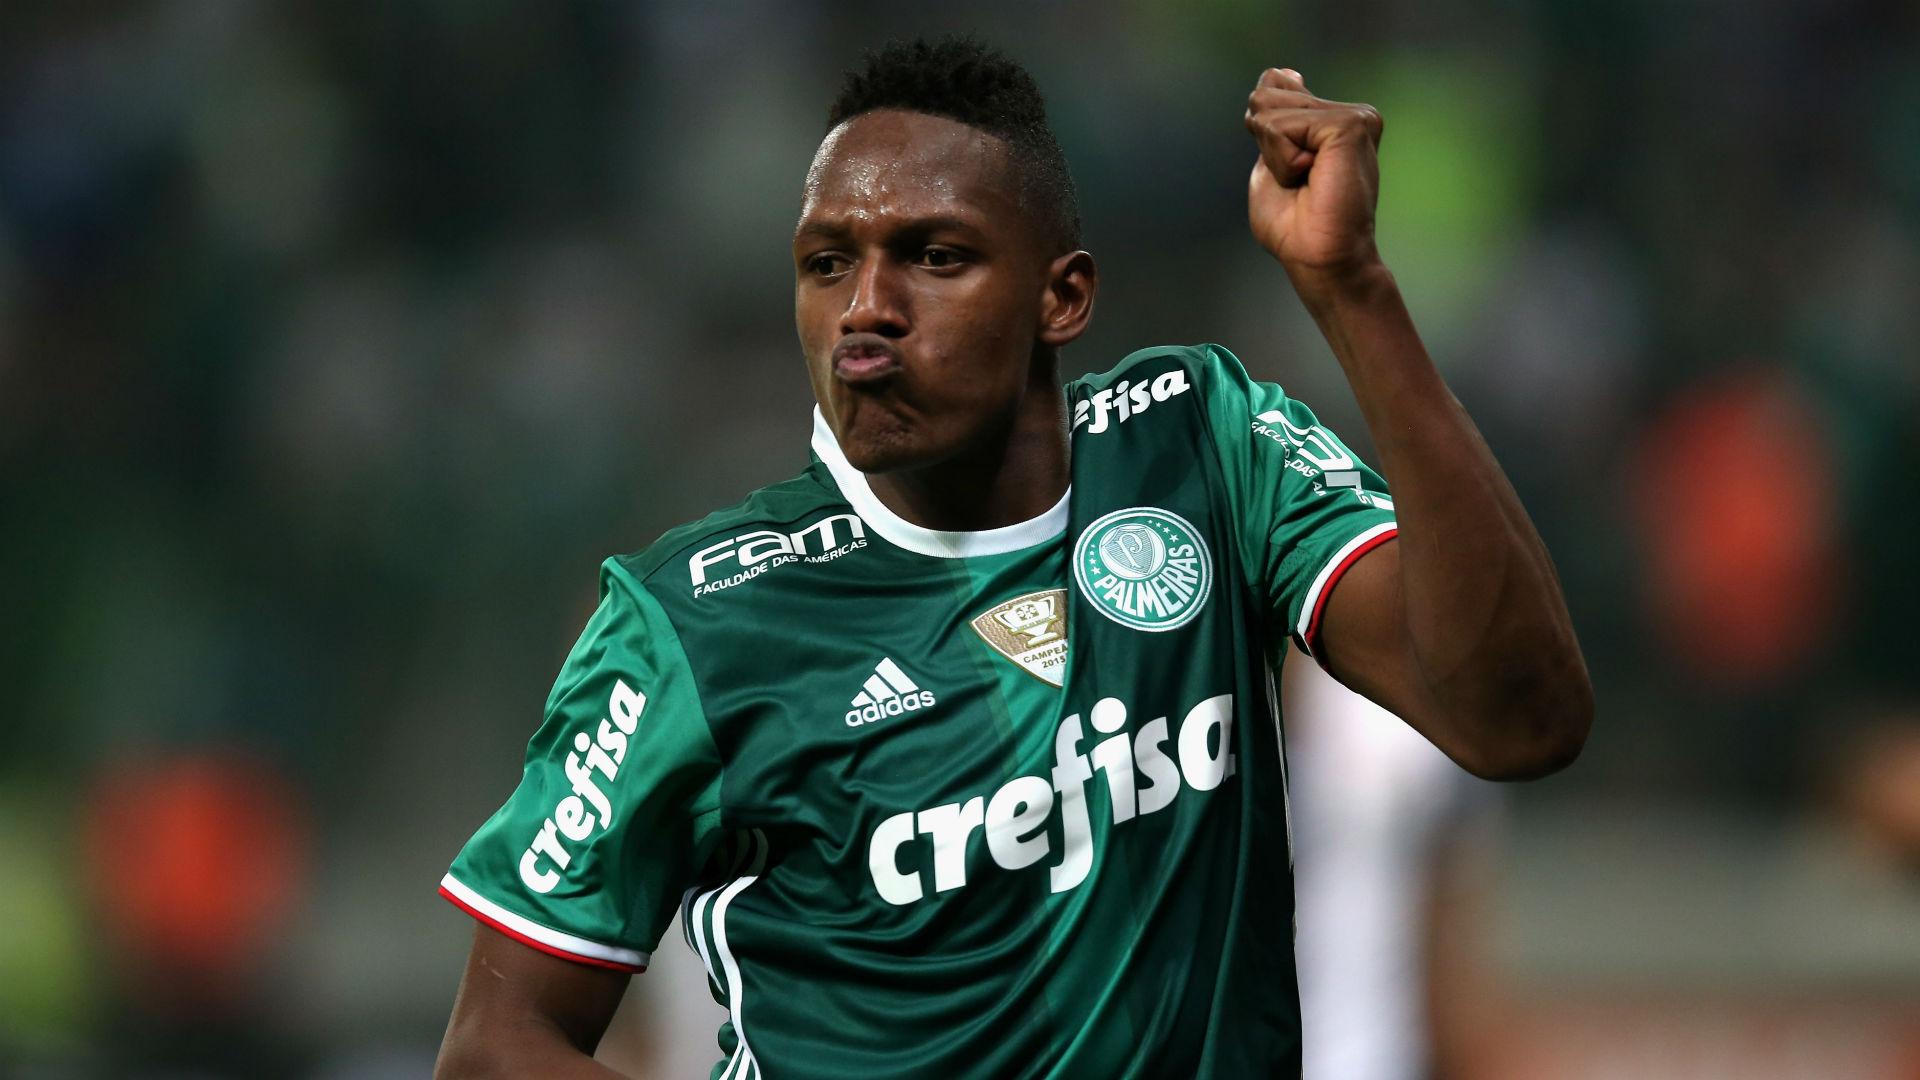 Yerry Mina Palmeiras 2016